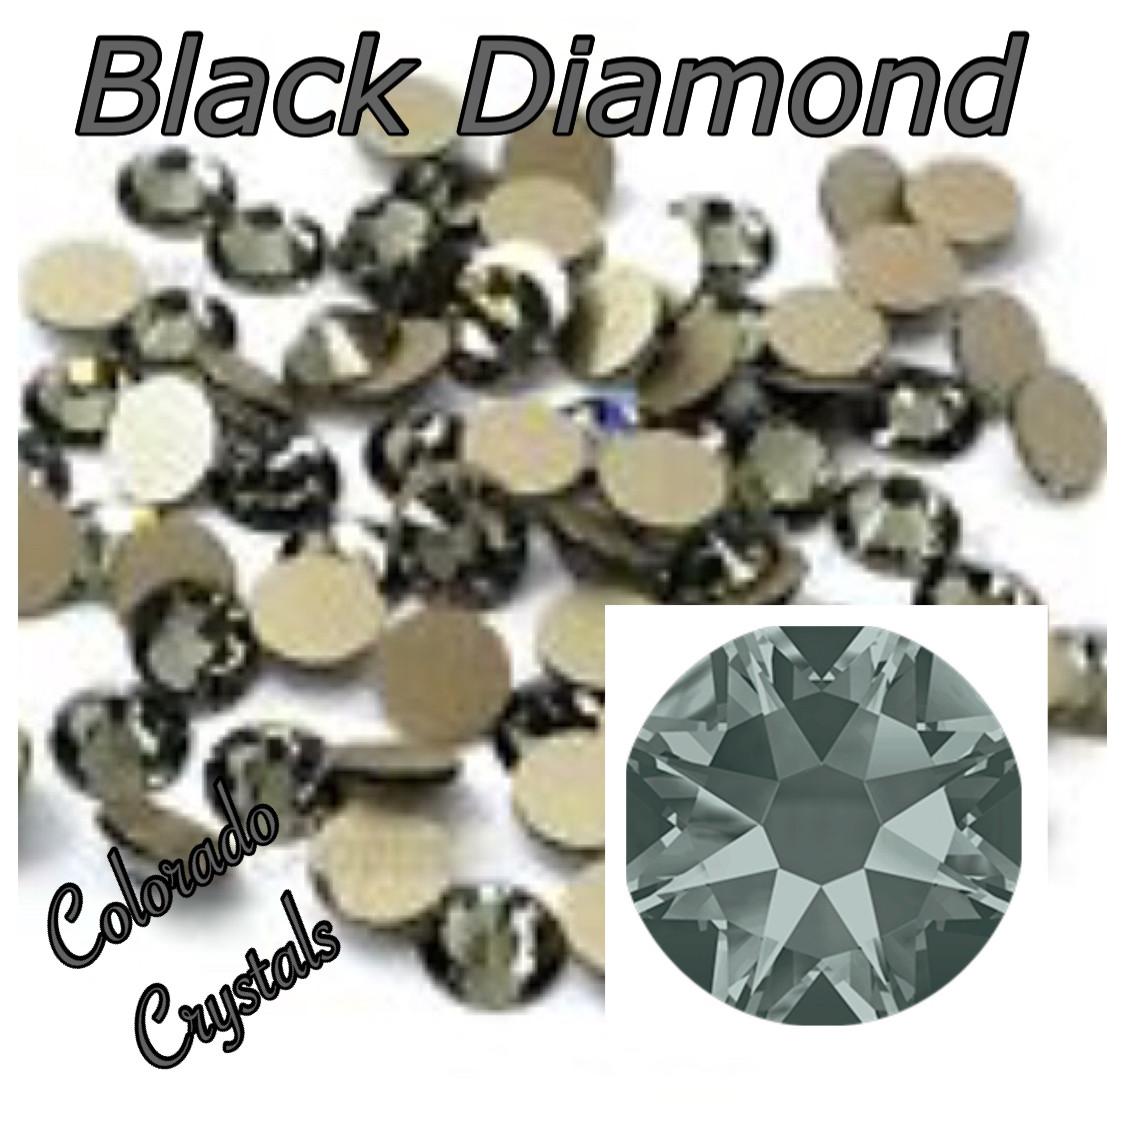 Black Diamond 9ss 2058 Limited